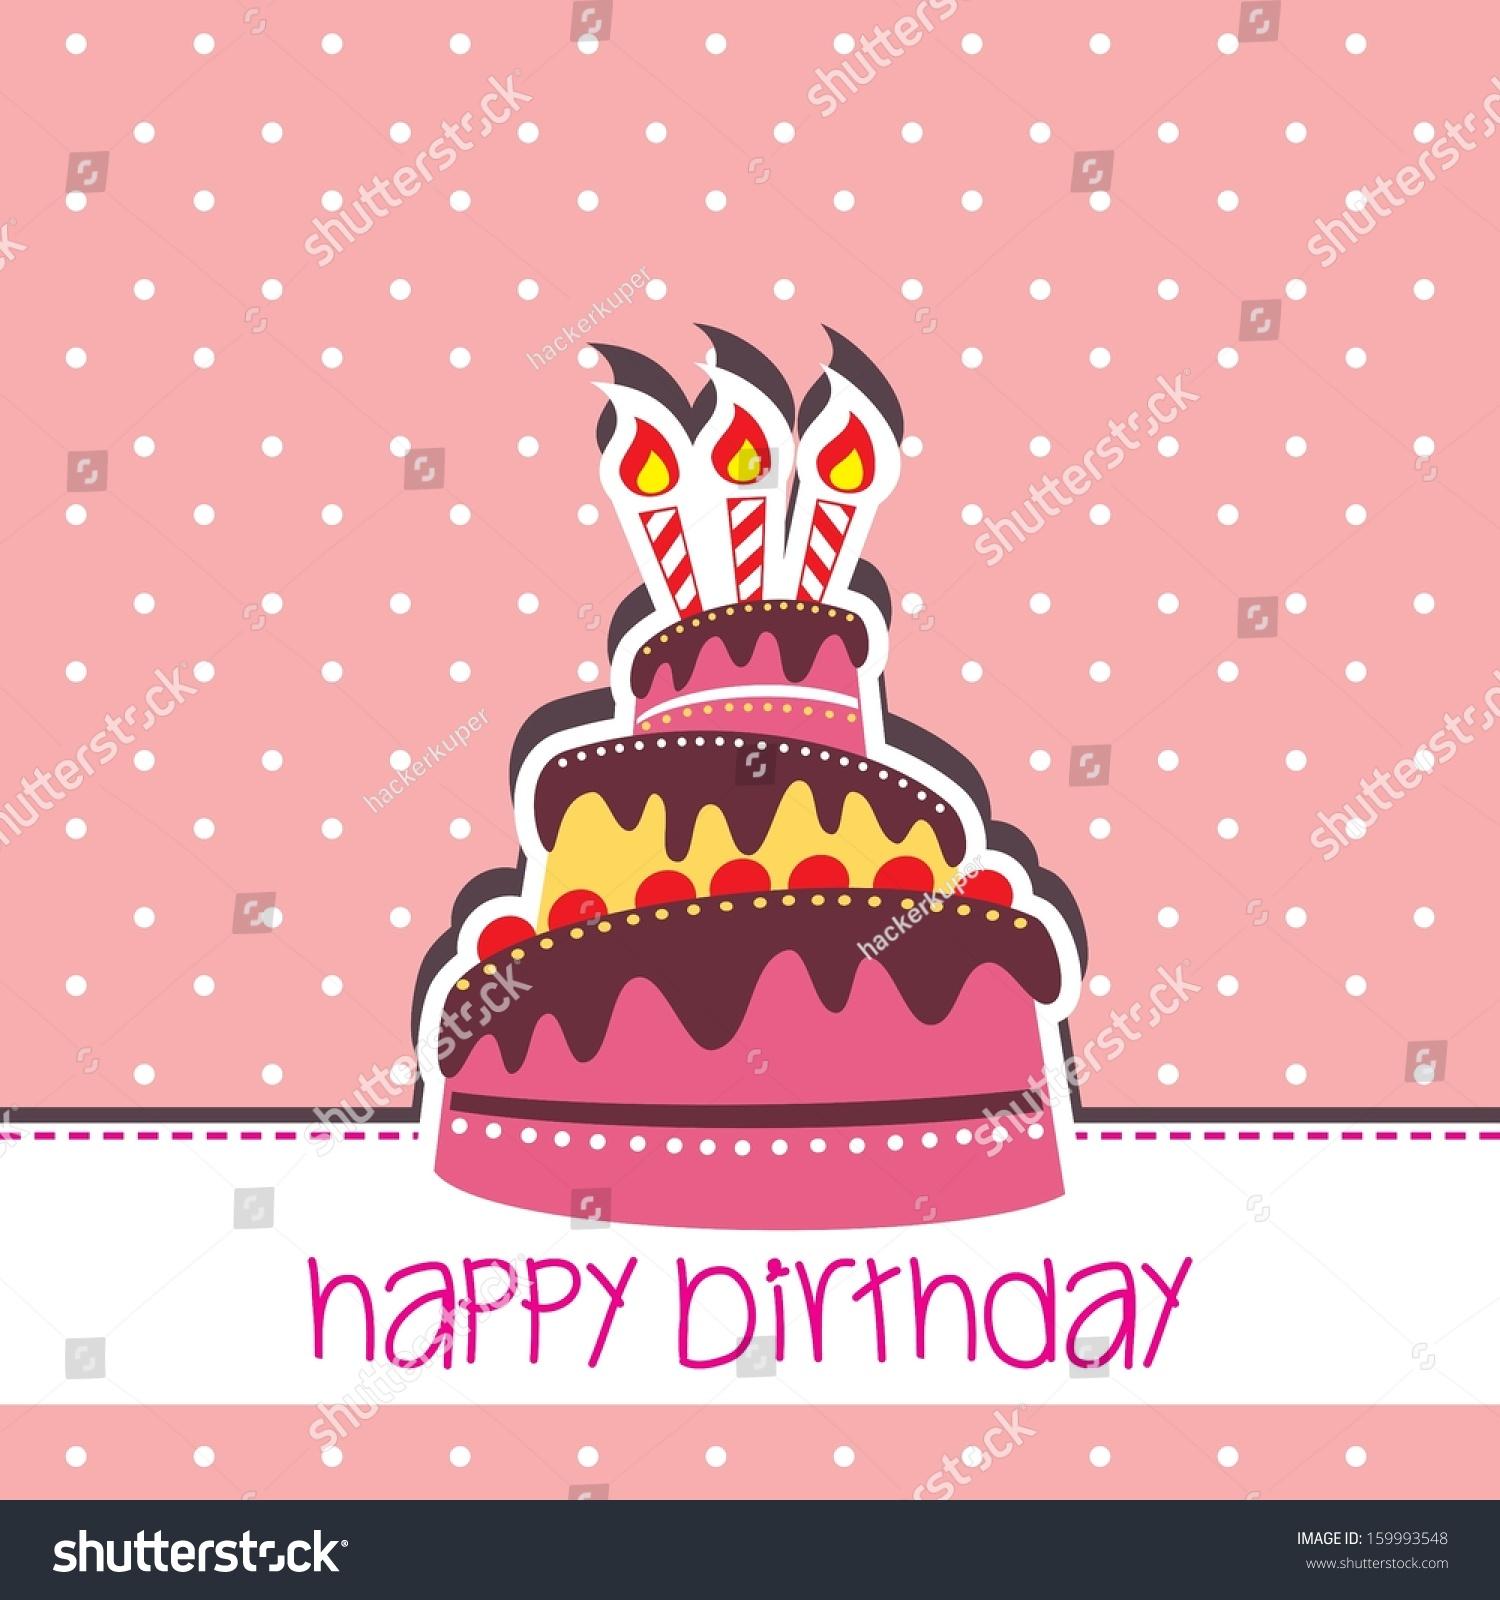 Wonderful Happy Birthday Cake Card Vector Pink Background Template Design Ideas